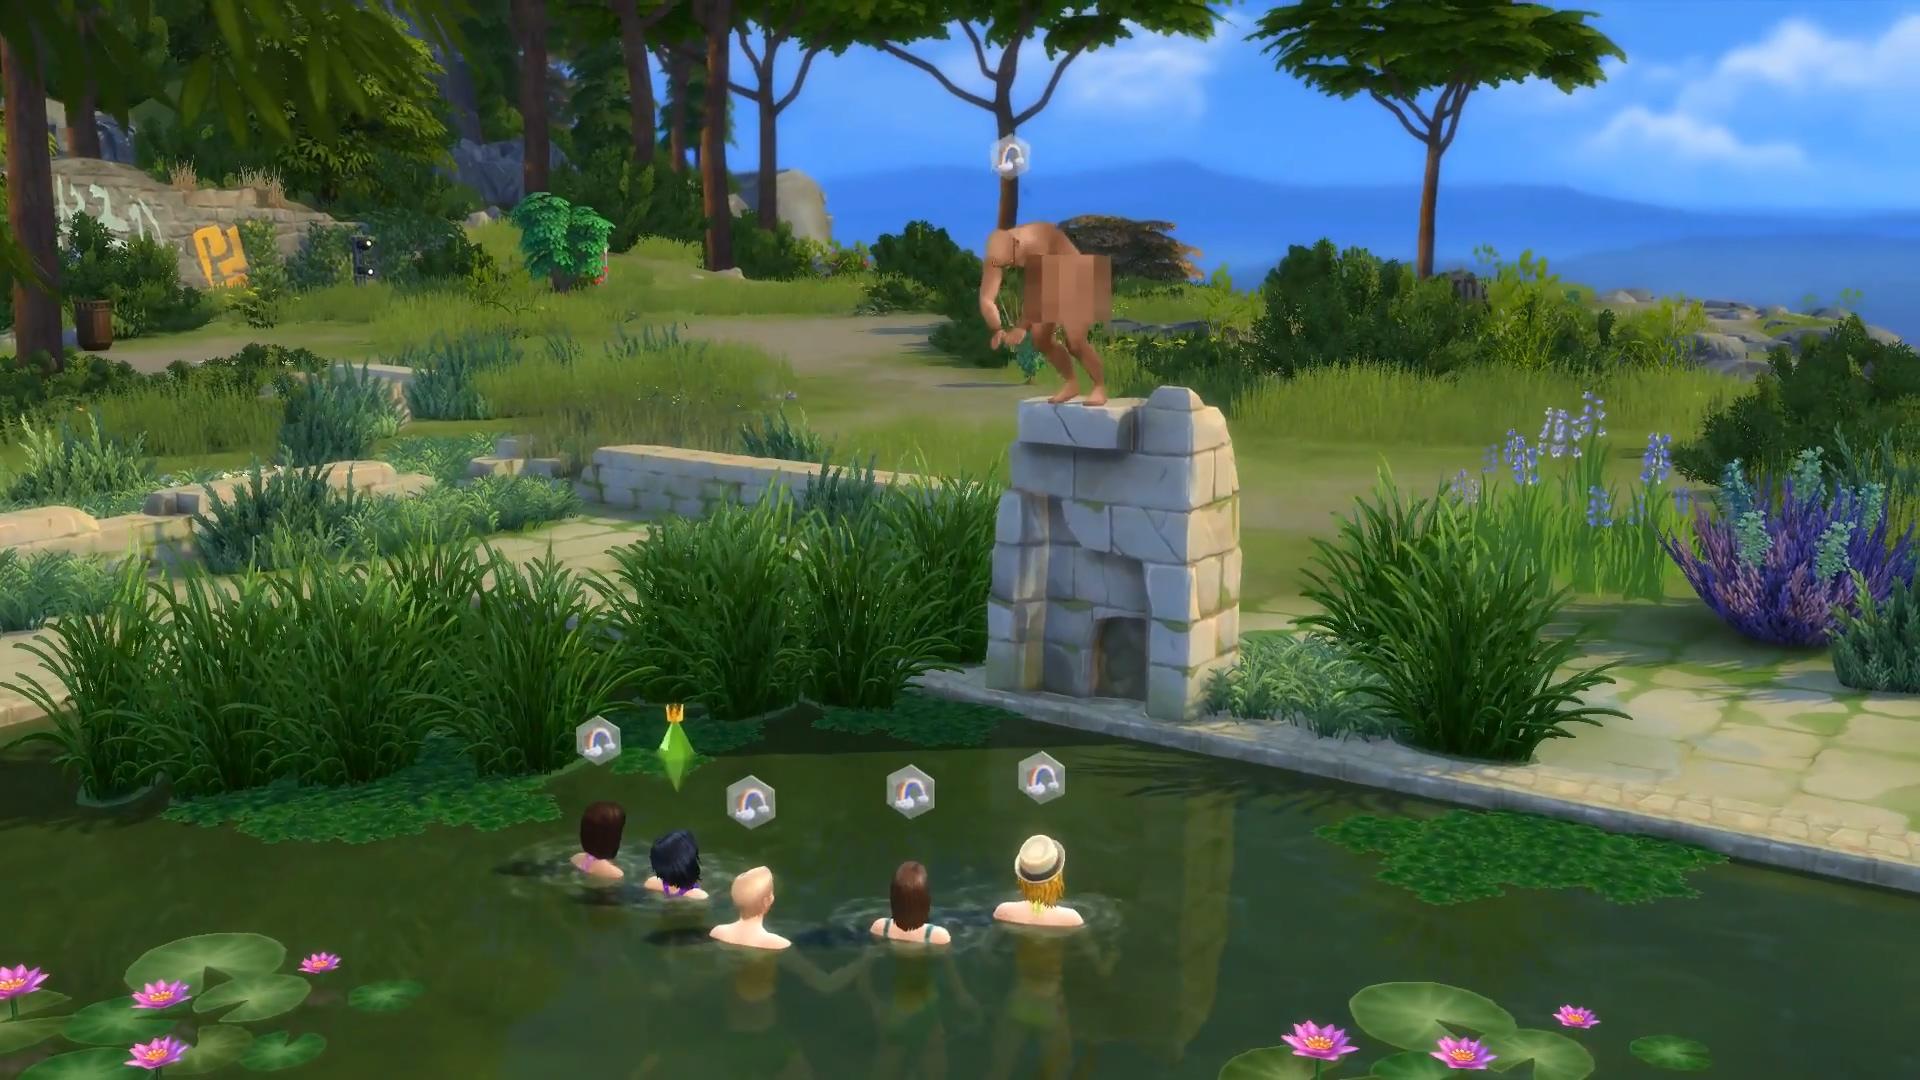 Falling Water Wallpaper 1080p Sims 4 Skinny Dipping Simcitizens